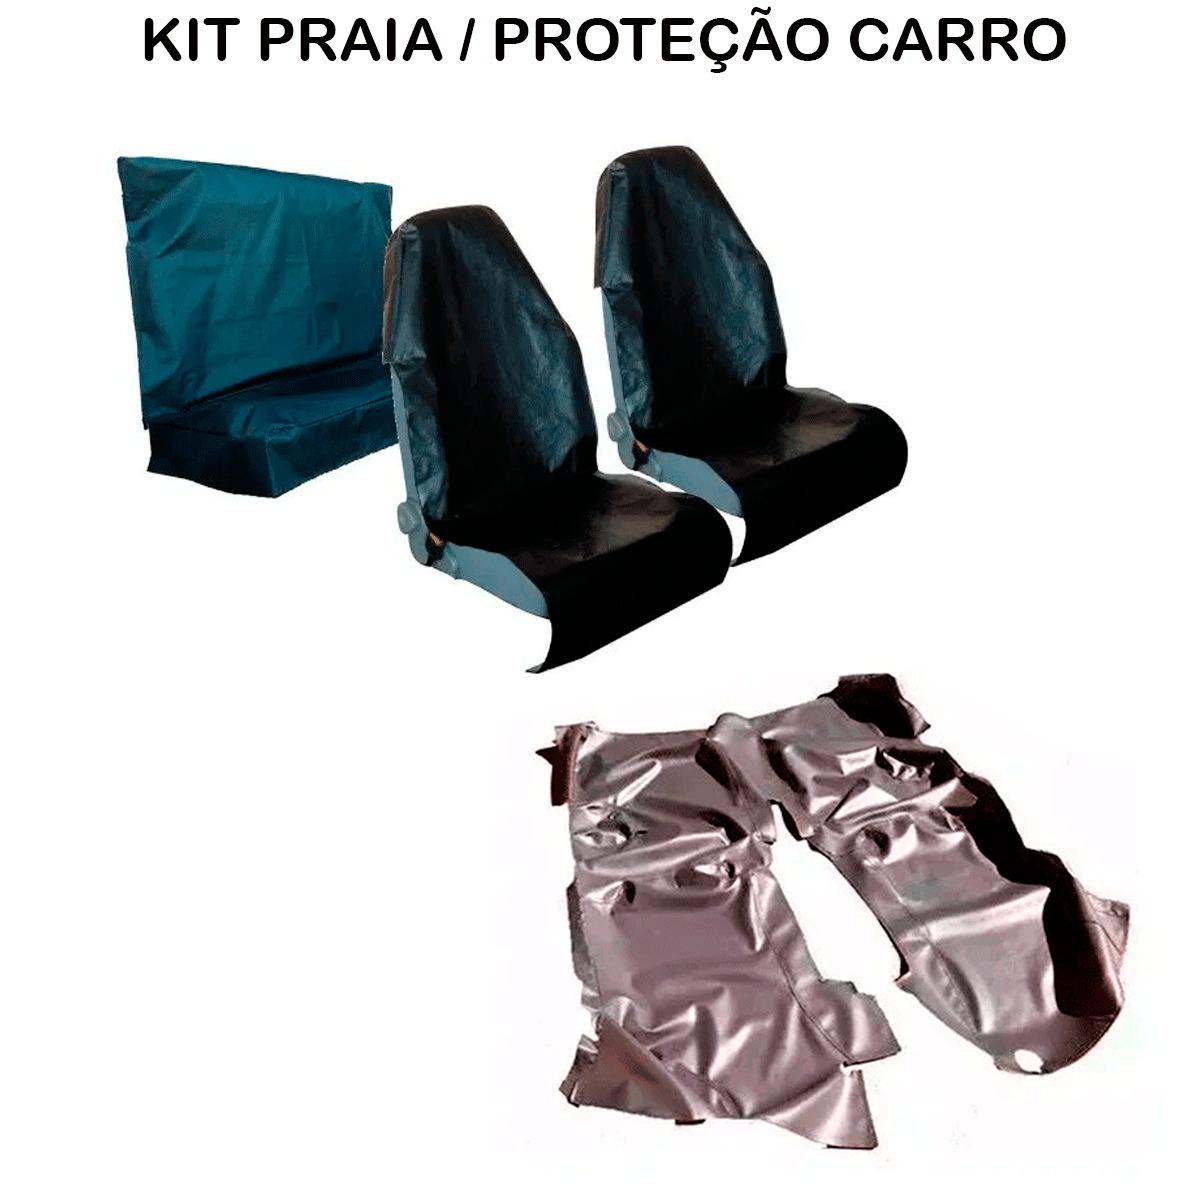 Tapete Em Vinil Ford Escort todos + Capa Banco Protecao Banco Areia Suor Academia